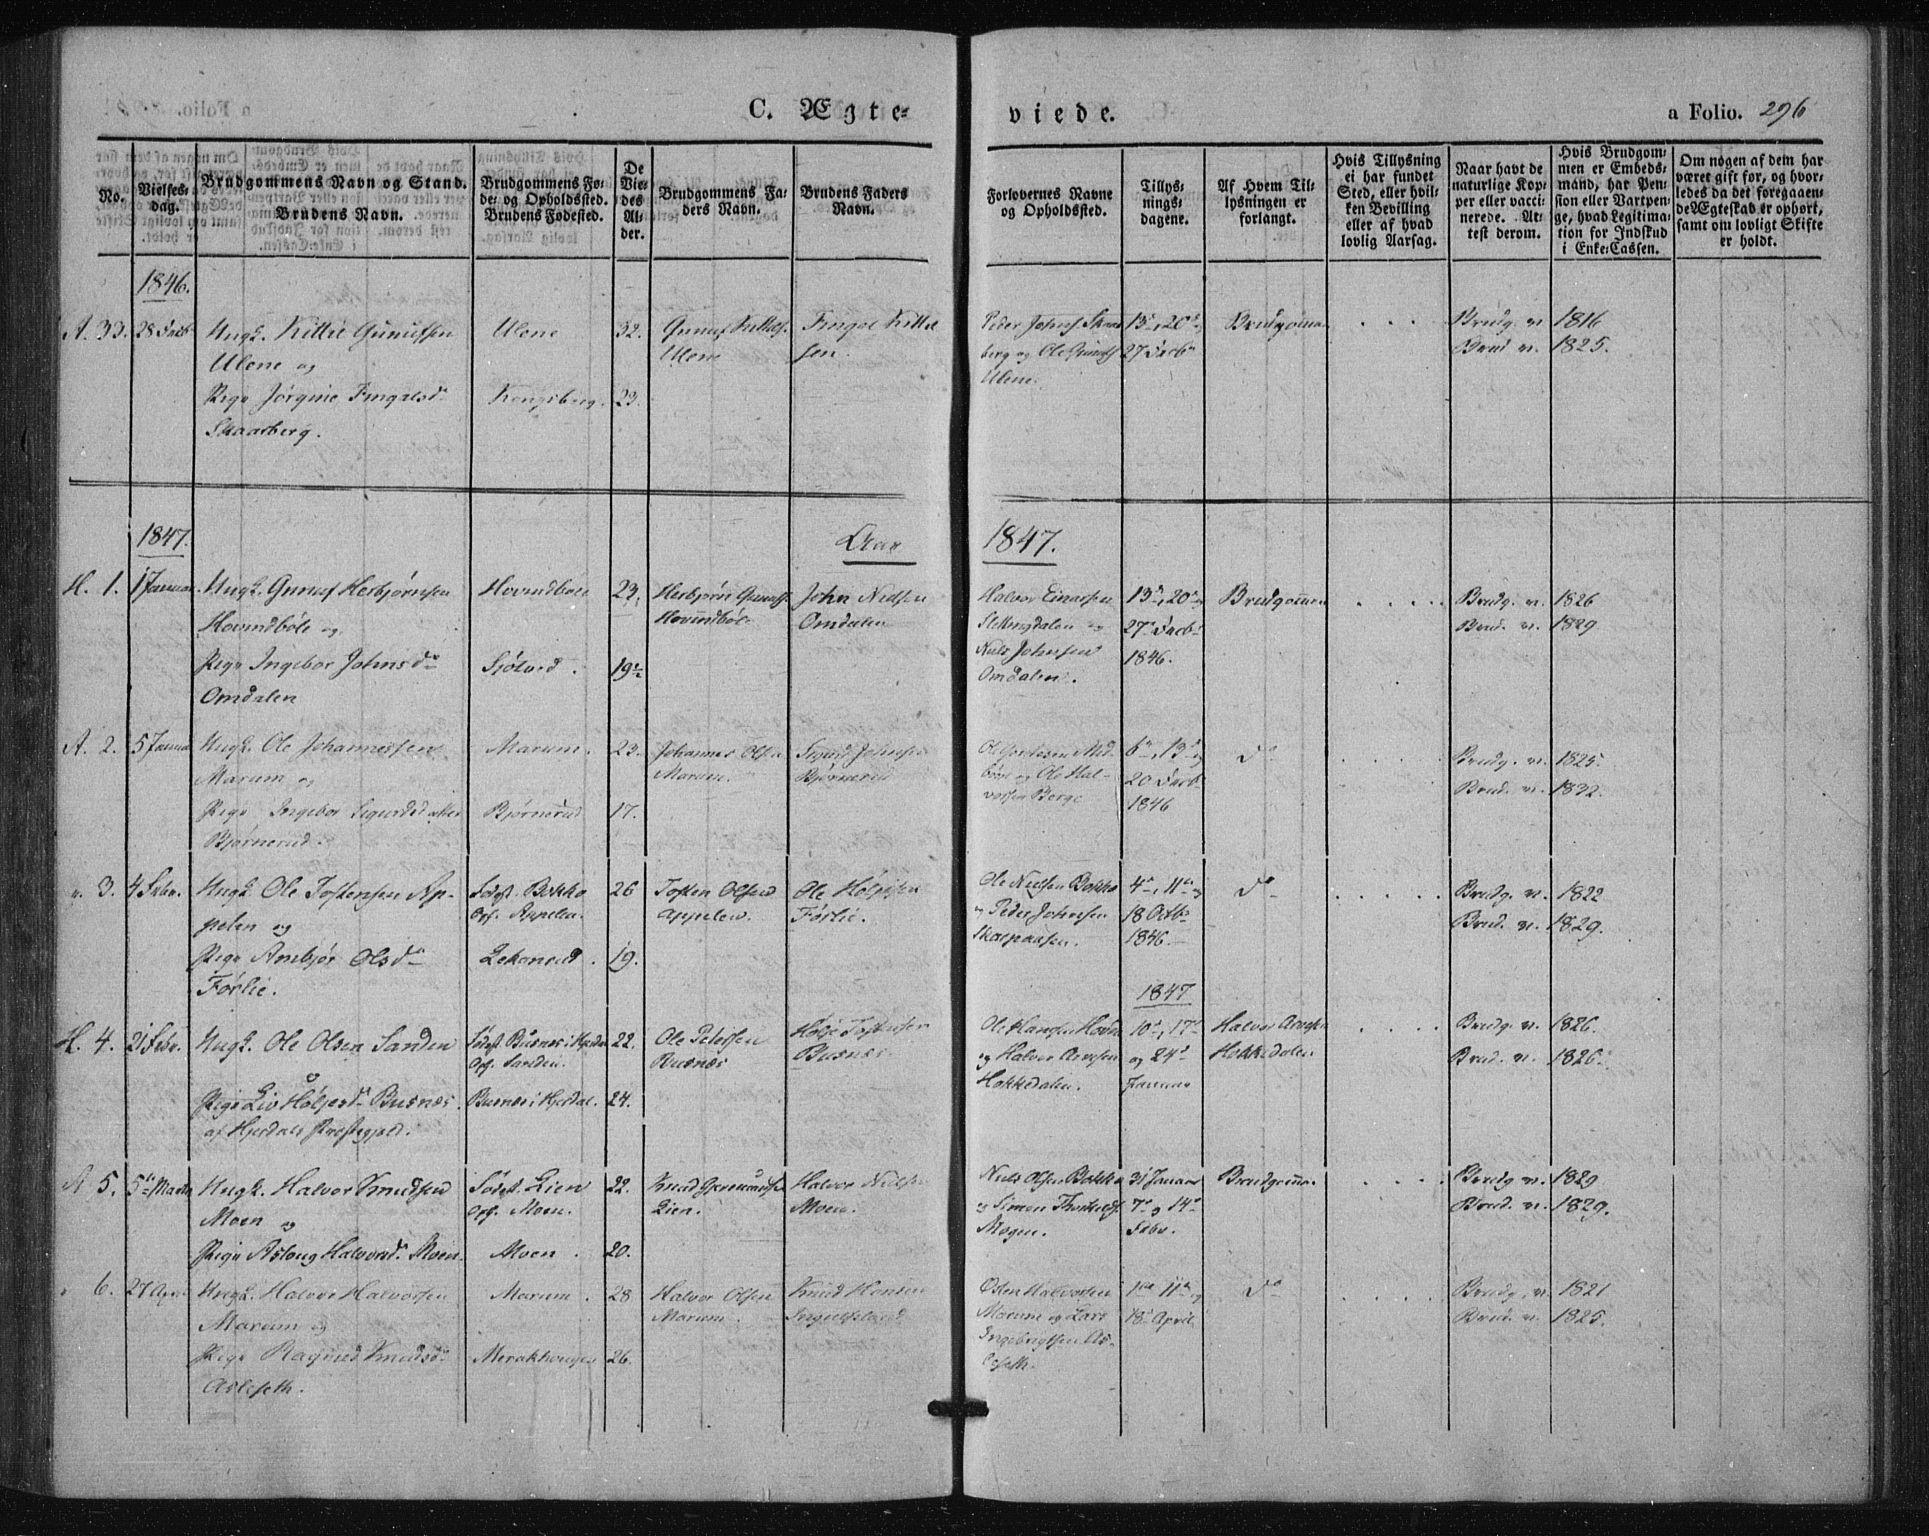 SAKO, Tinn kirkebøker, F/Fa/L0005: Ministerialbok nr. I 5, 1844-1856, s. 296